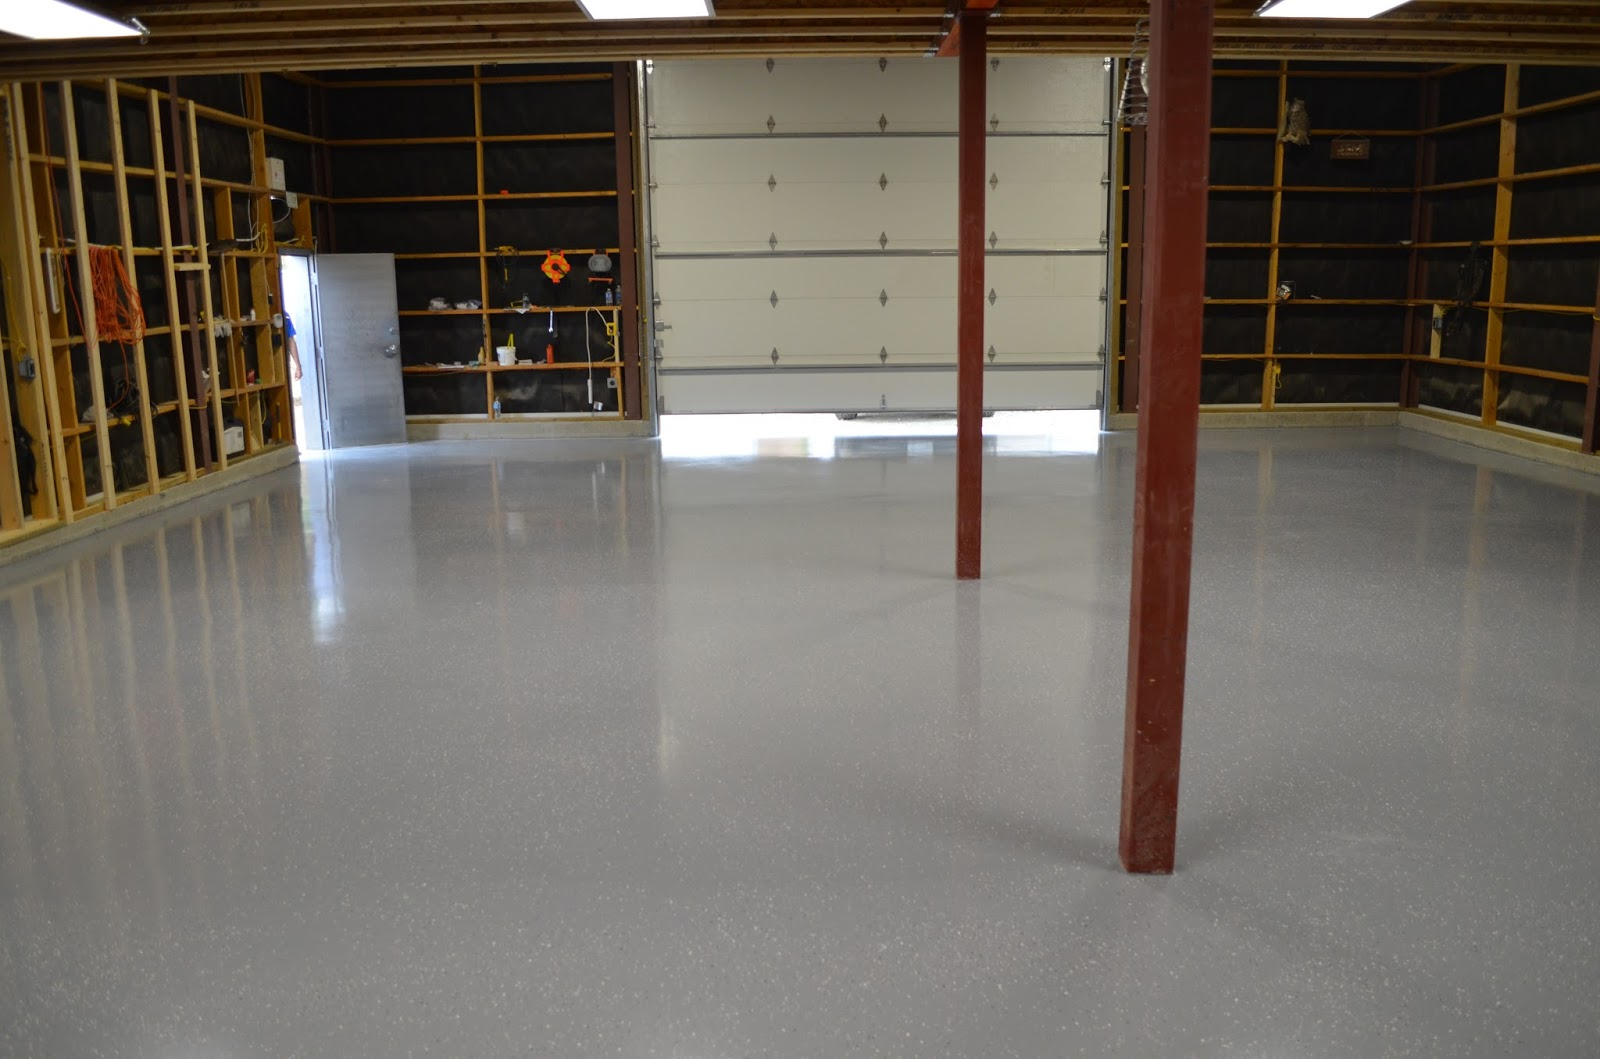 Epoxy Kitchen Floor Mode Concrete Epoxy Floor Specialists Mode Concrete In Kelowna Bc